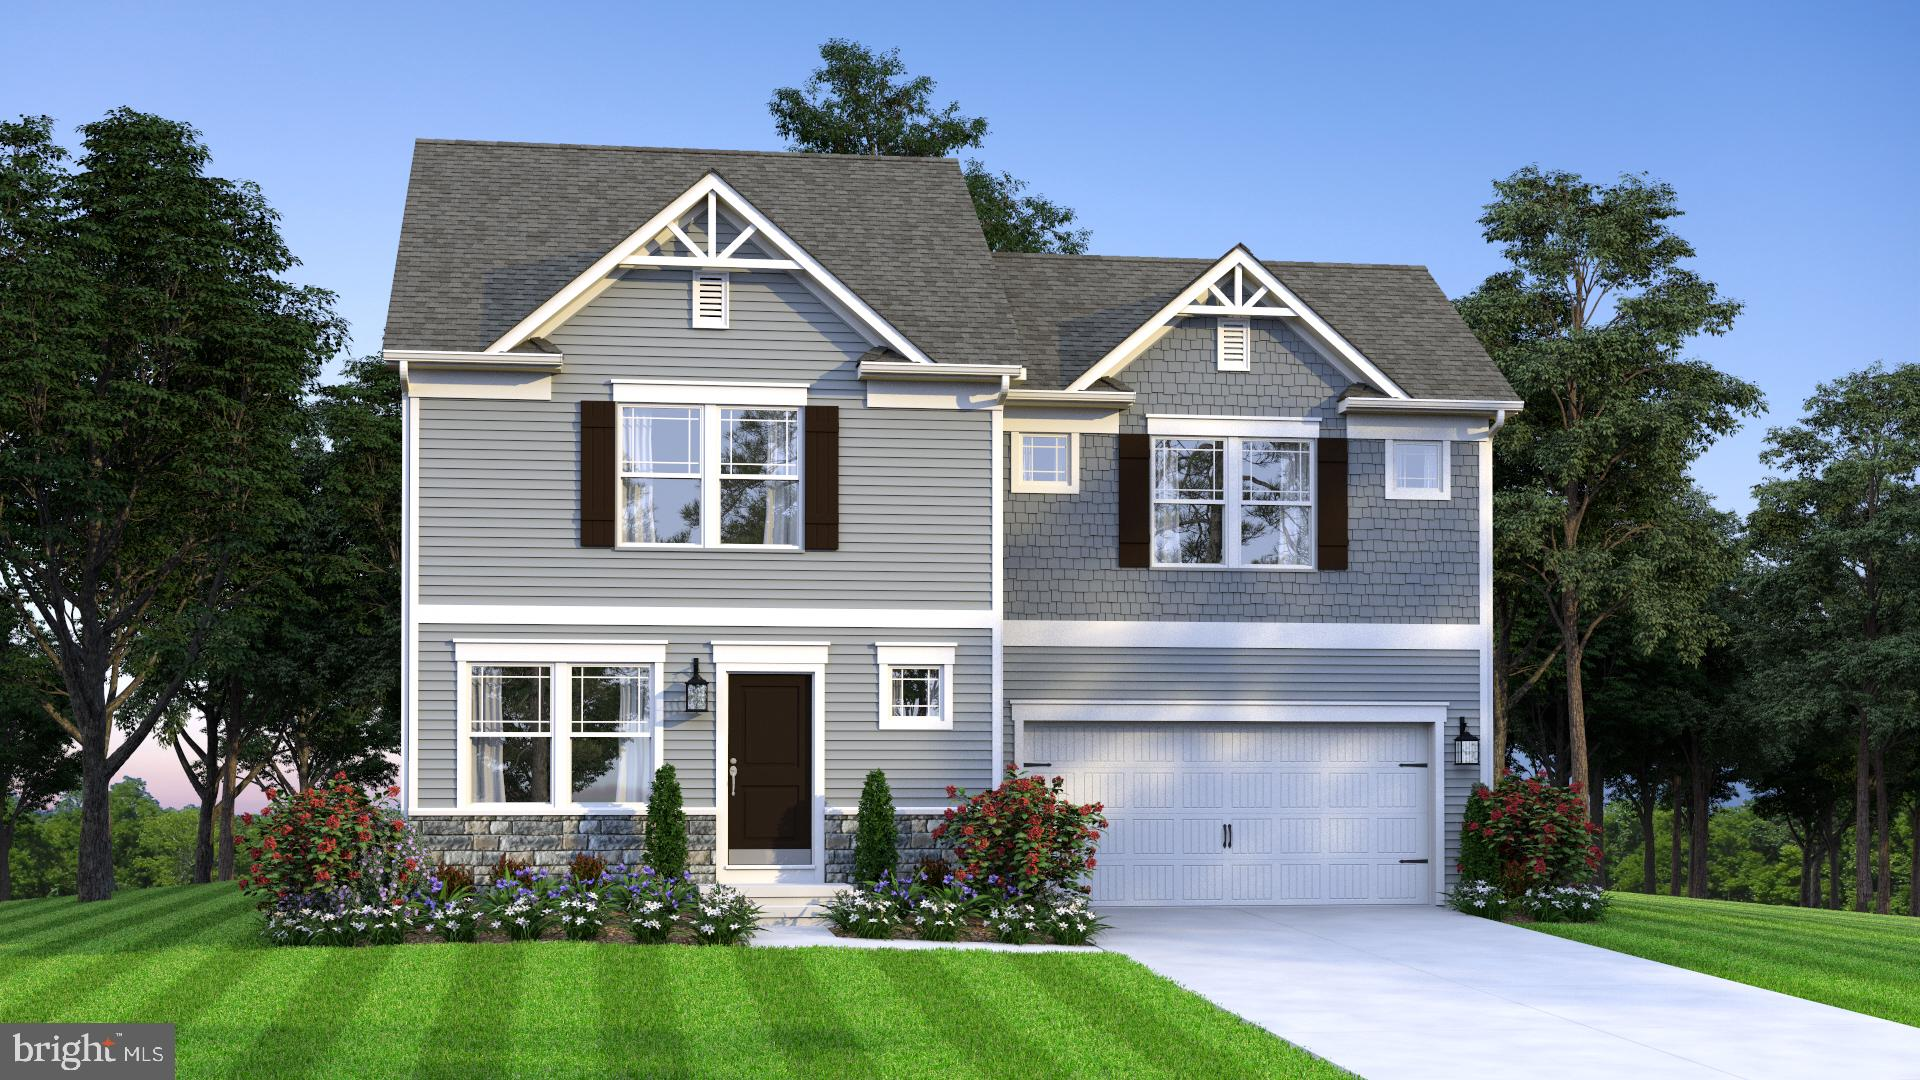 Lot 1110 Amidship Dr, Greenbackville, VA, 23356